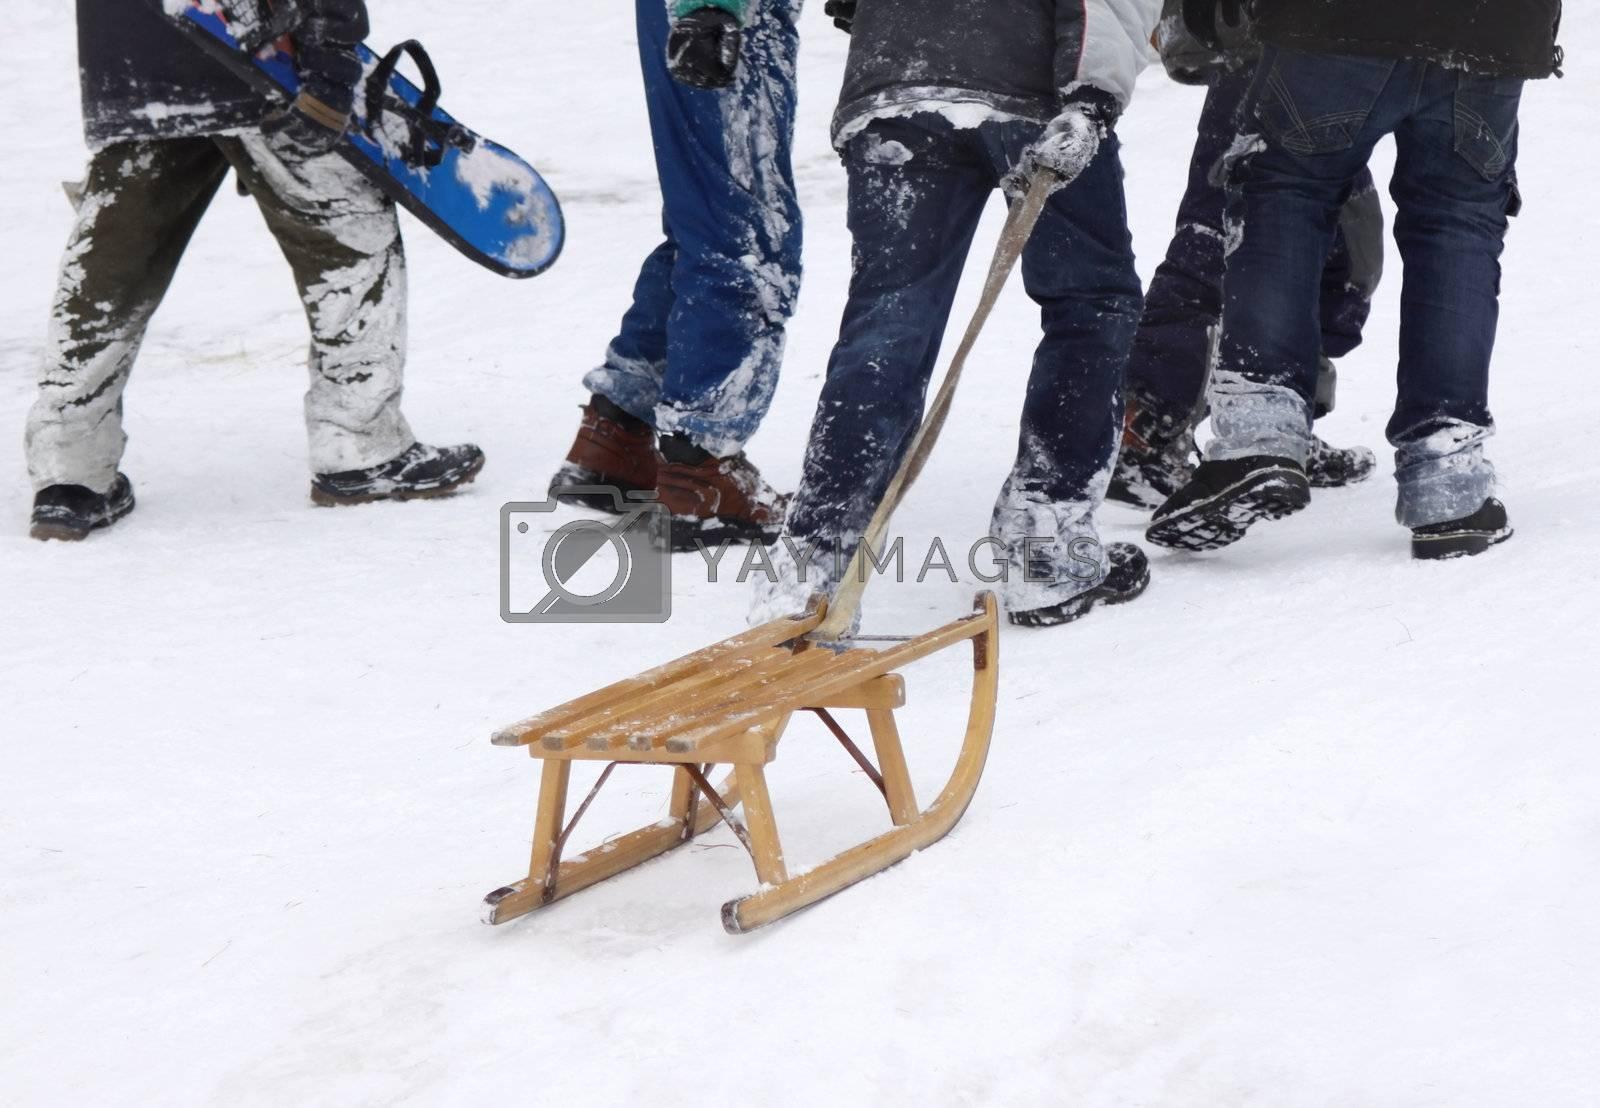 Winter fun by Vaidas Bucys